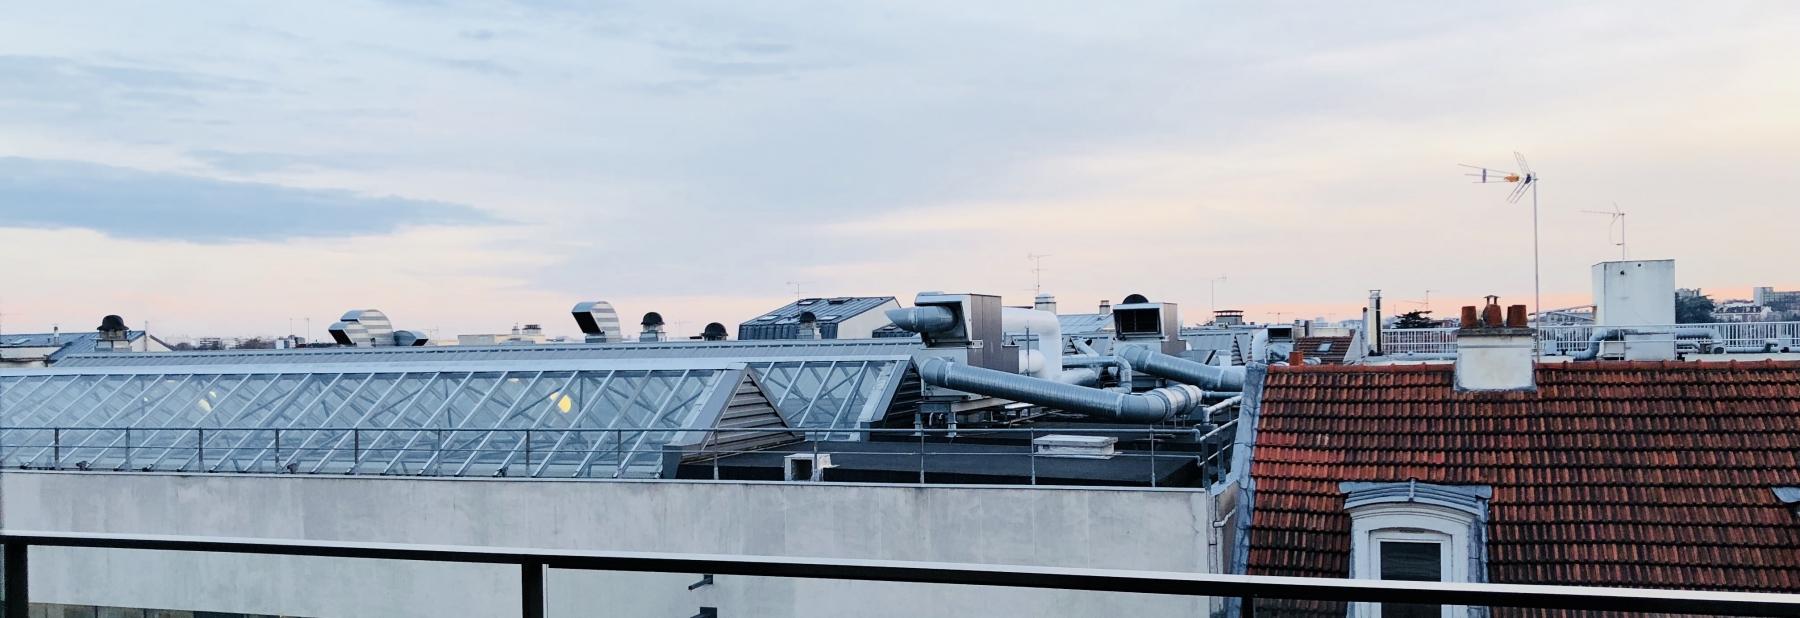 Vers les toits